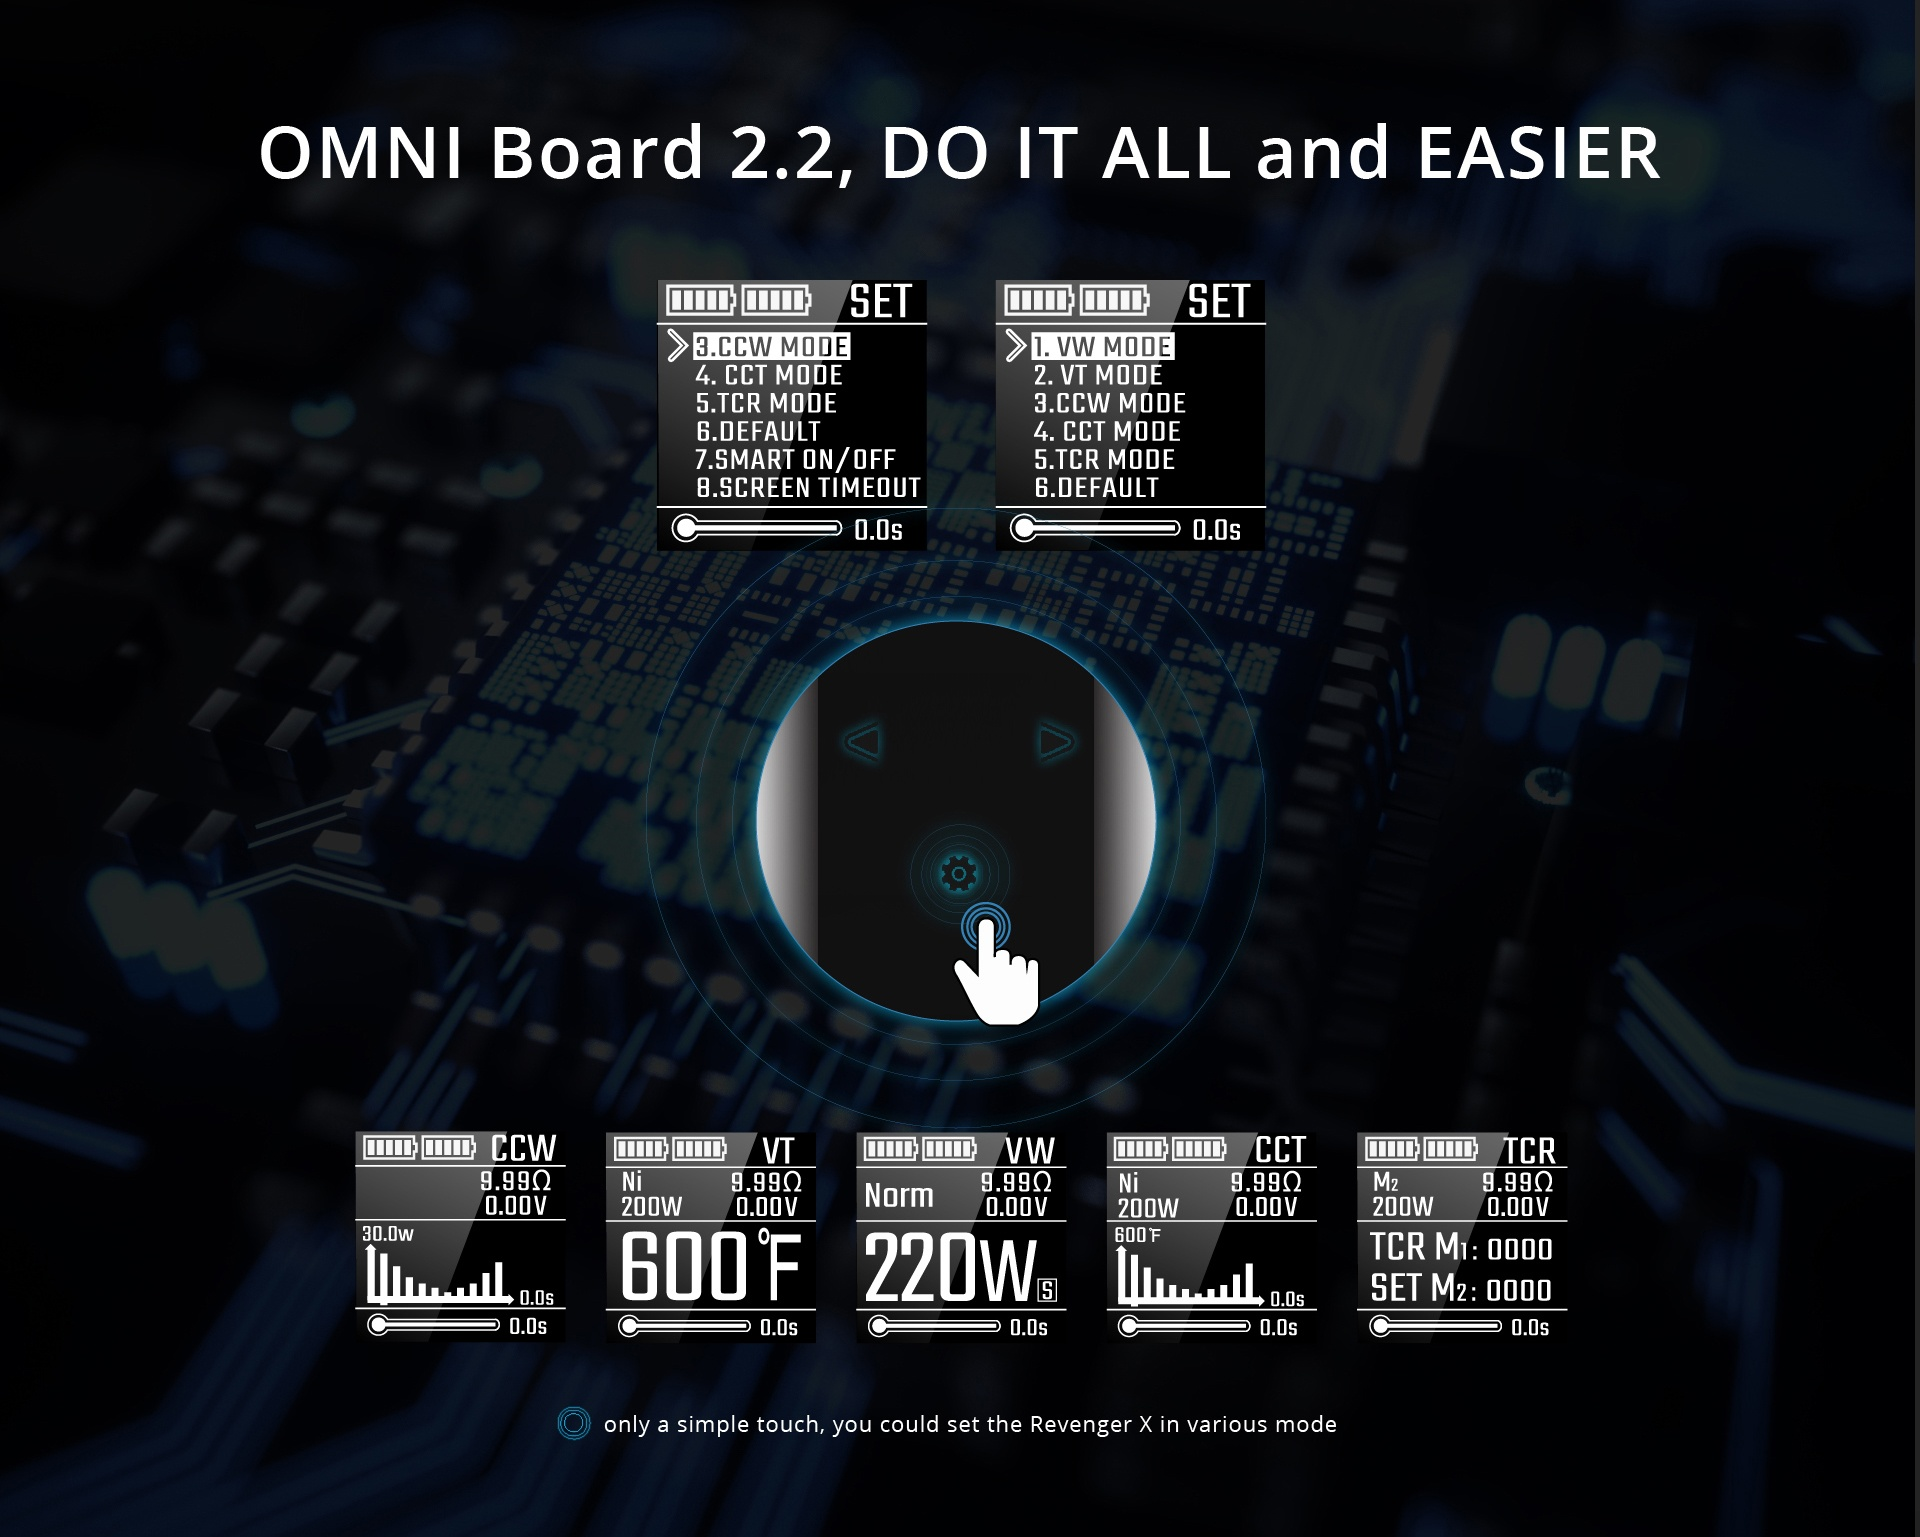 revenger_x_omni_board